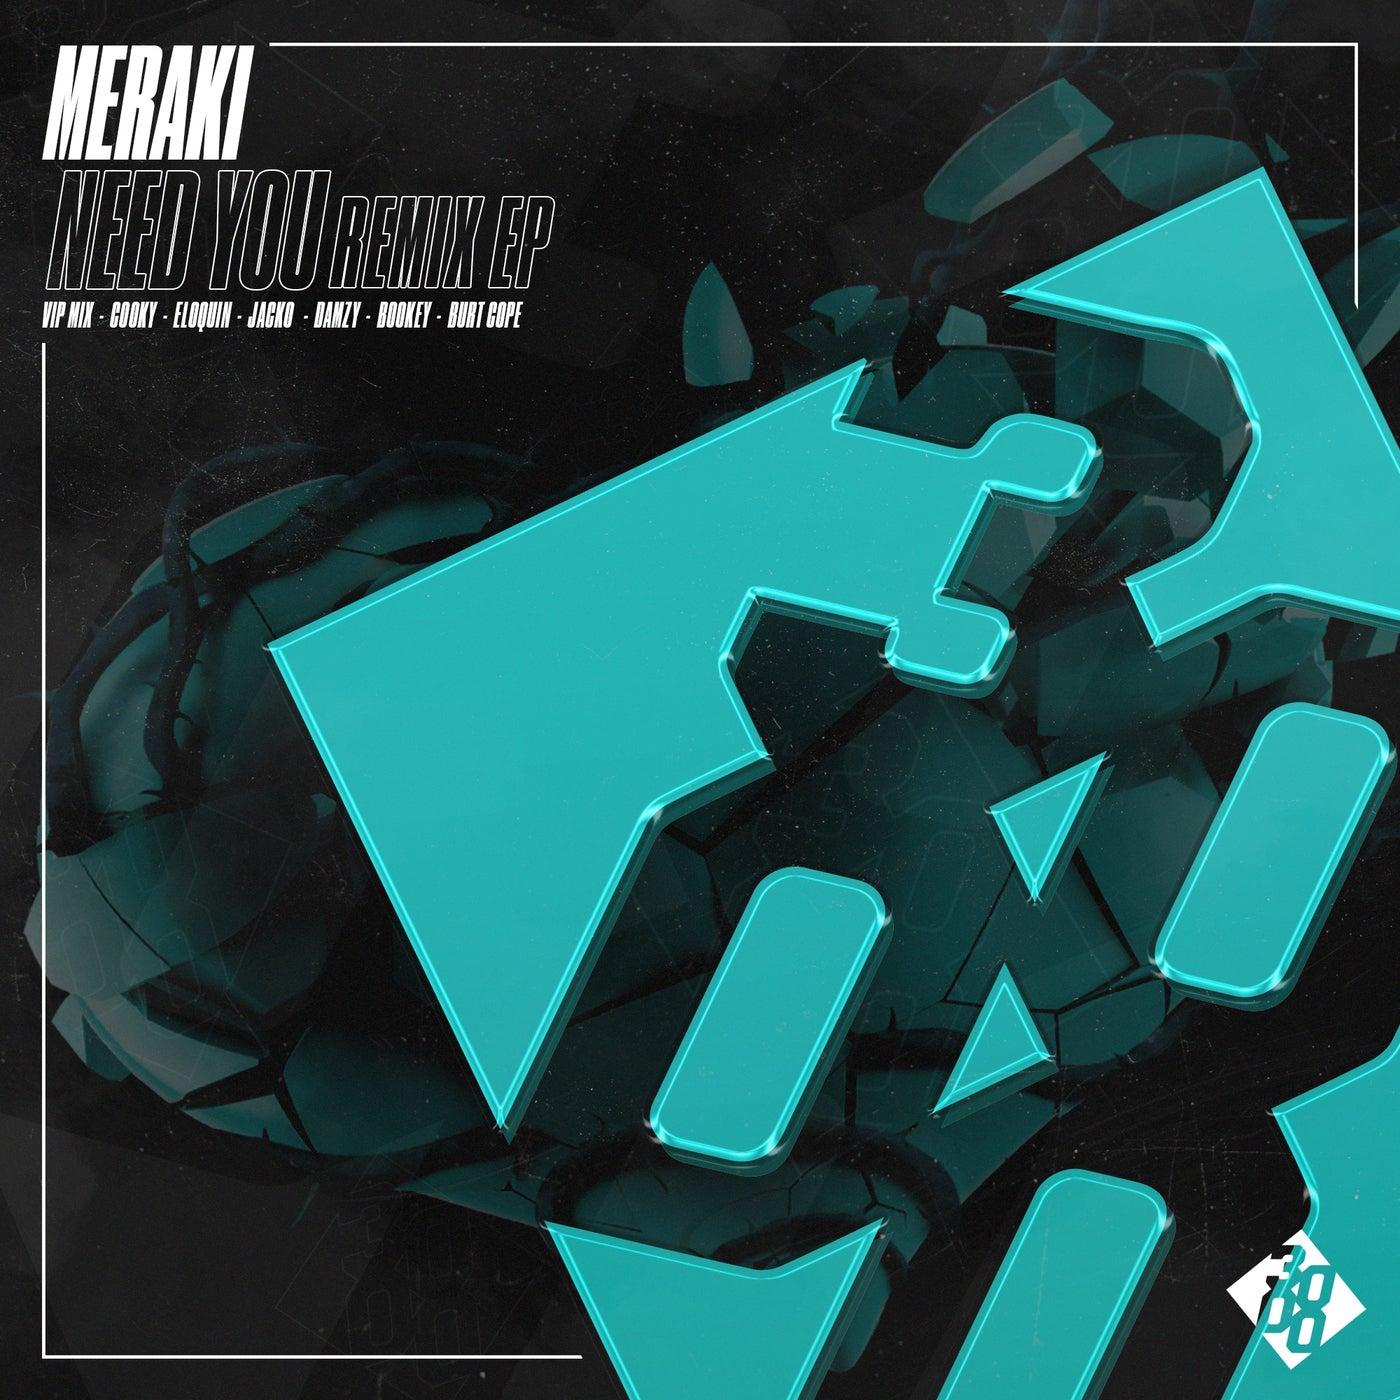 Need You (Damzy Remix)